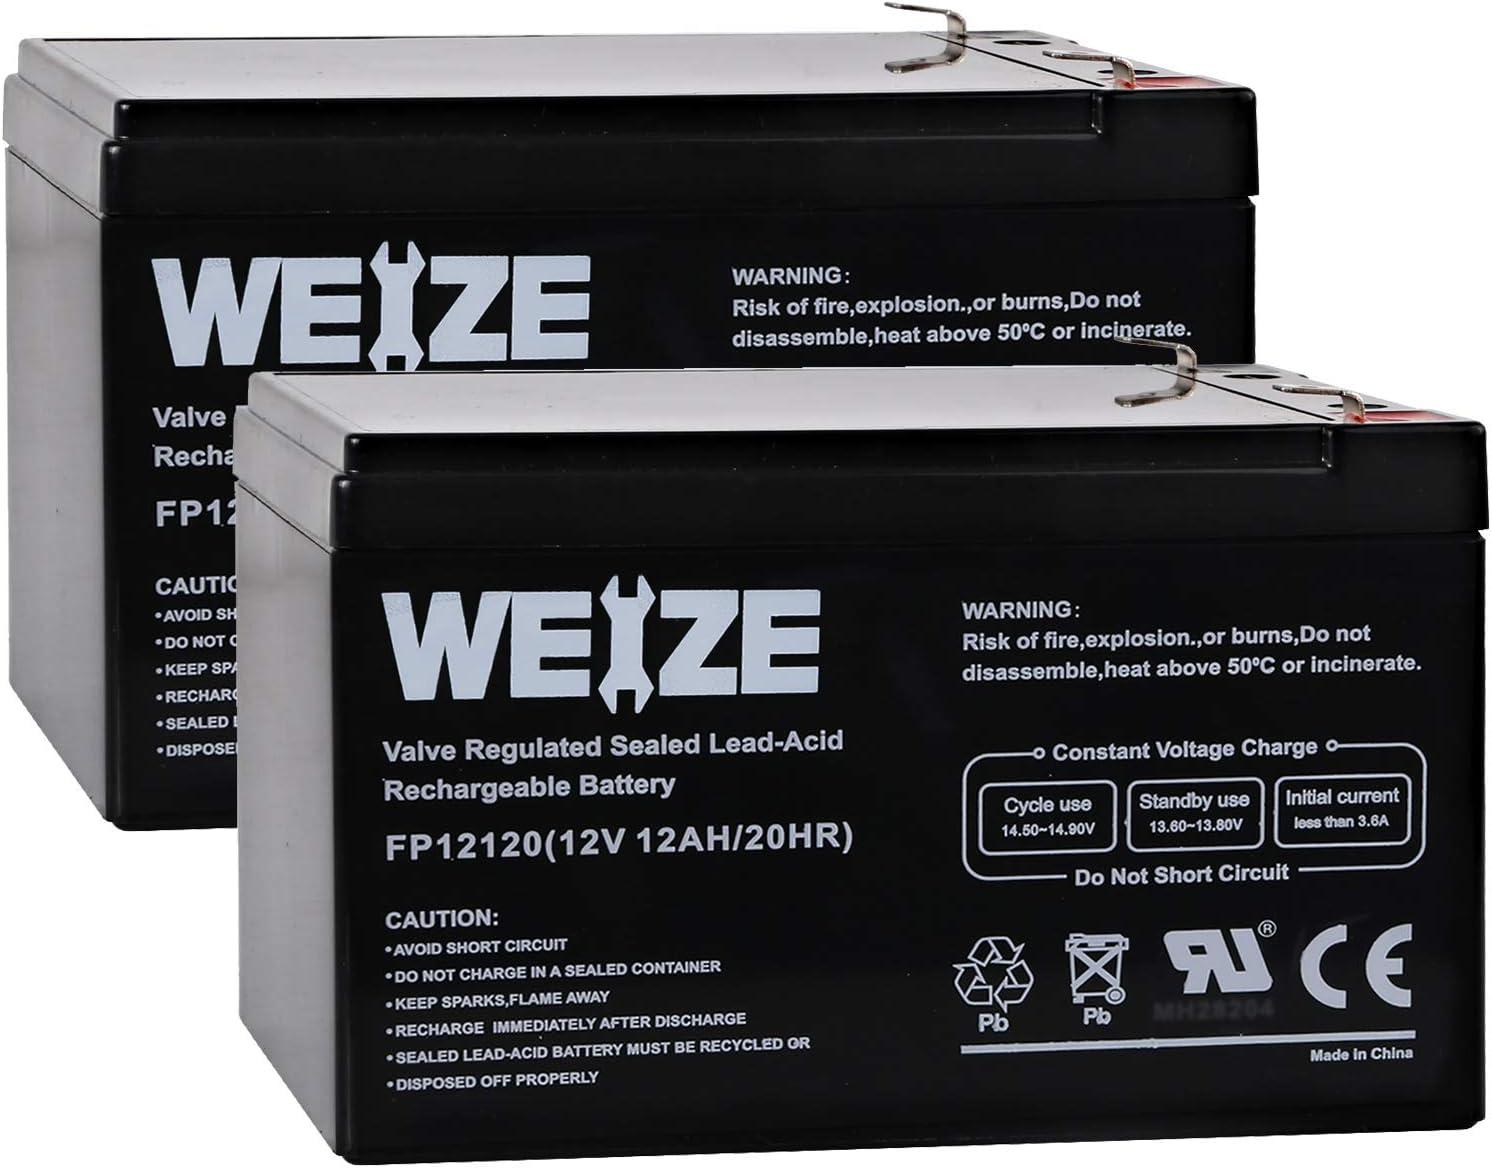 EXP1212 Weize 12 Volt 12AH SLA Rechargeable Battery Replace UB12120 GPS12-12F2 2 Pack LHR12-12 6FM12